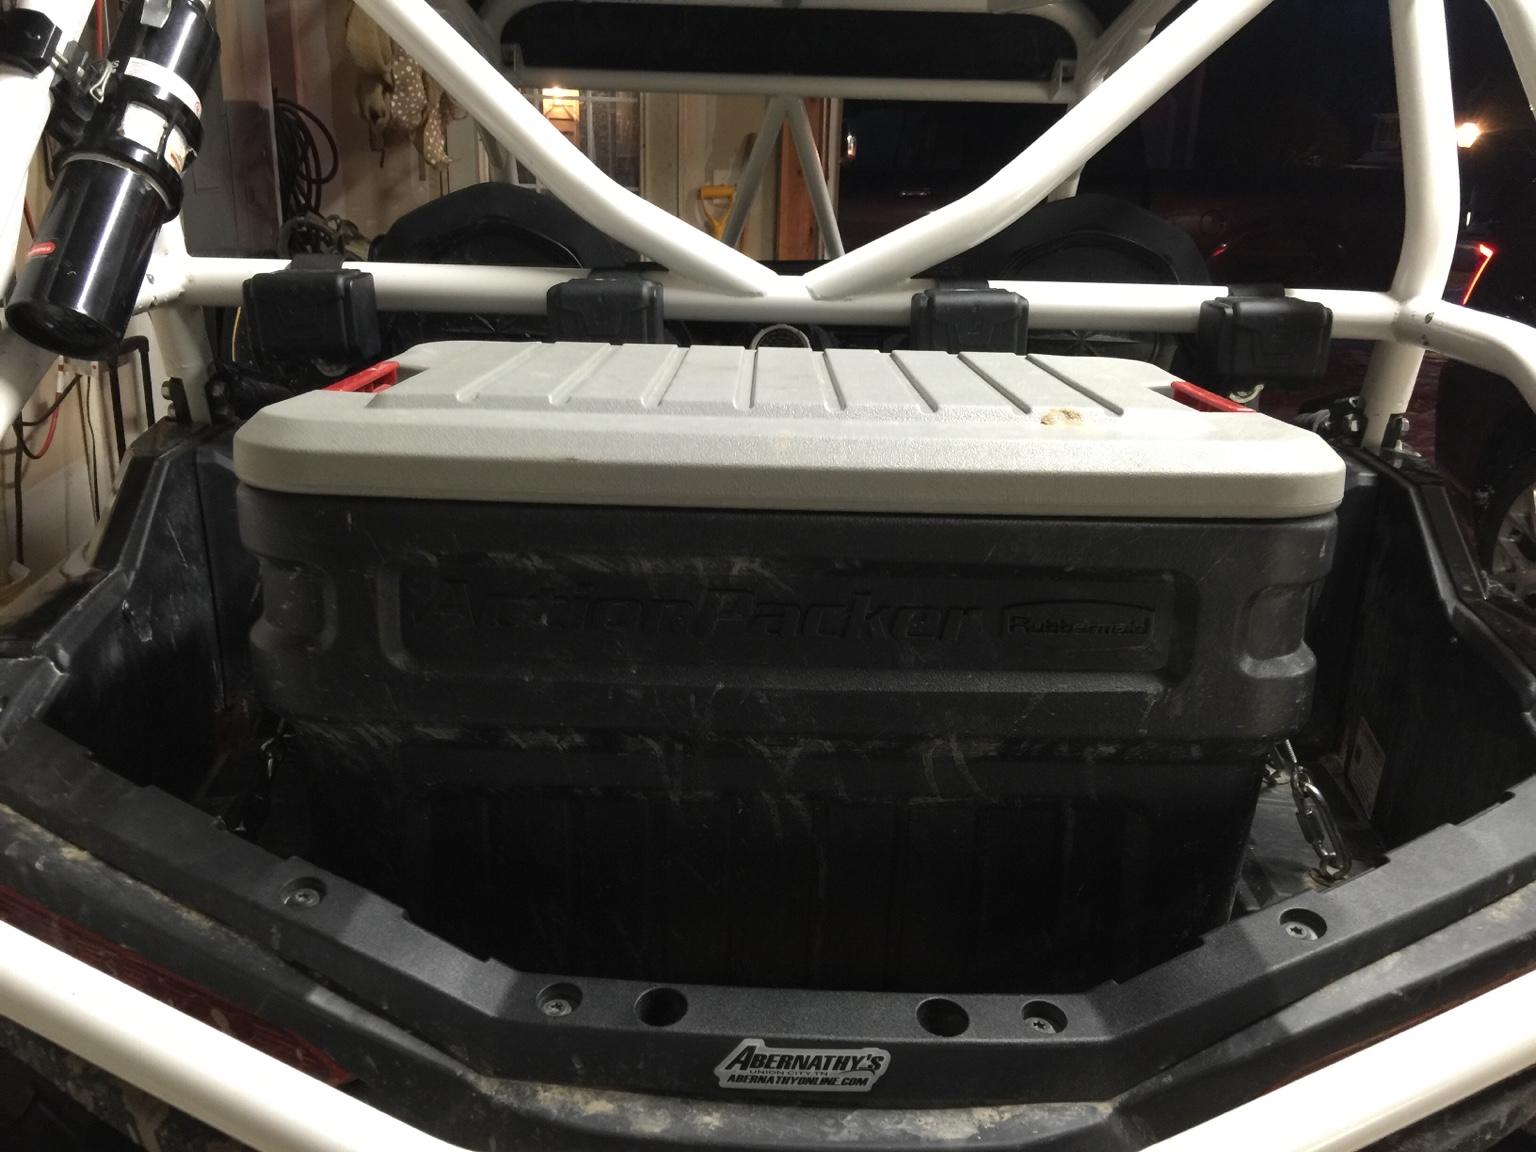 900 S Cargo Yeti 45 And Toolbox Polaris Rzr Forum